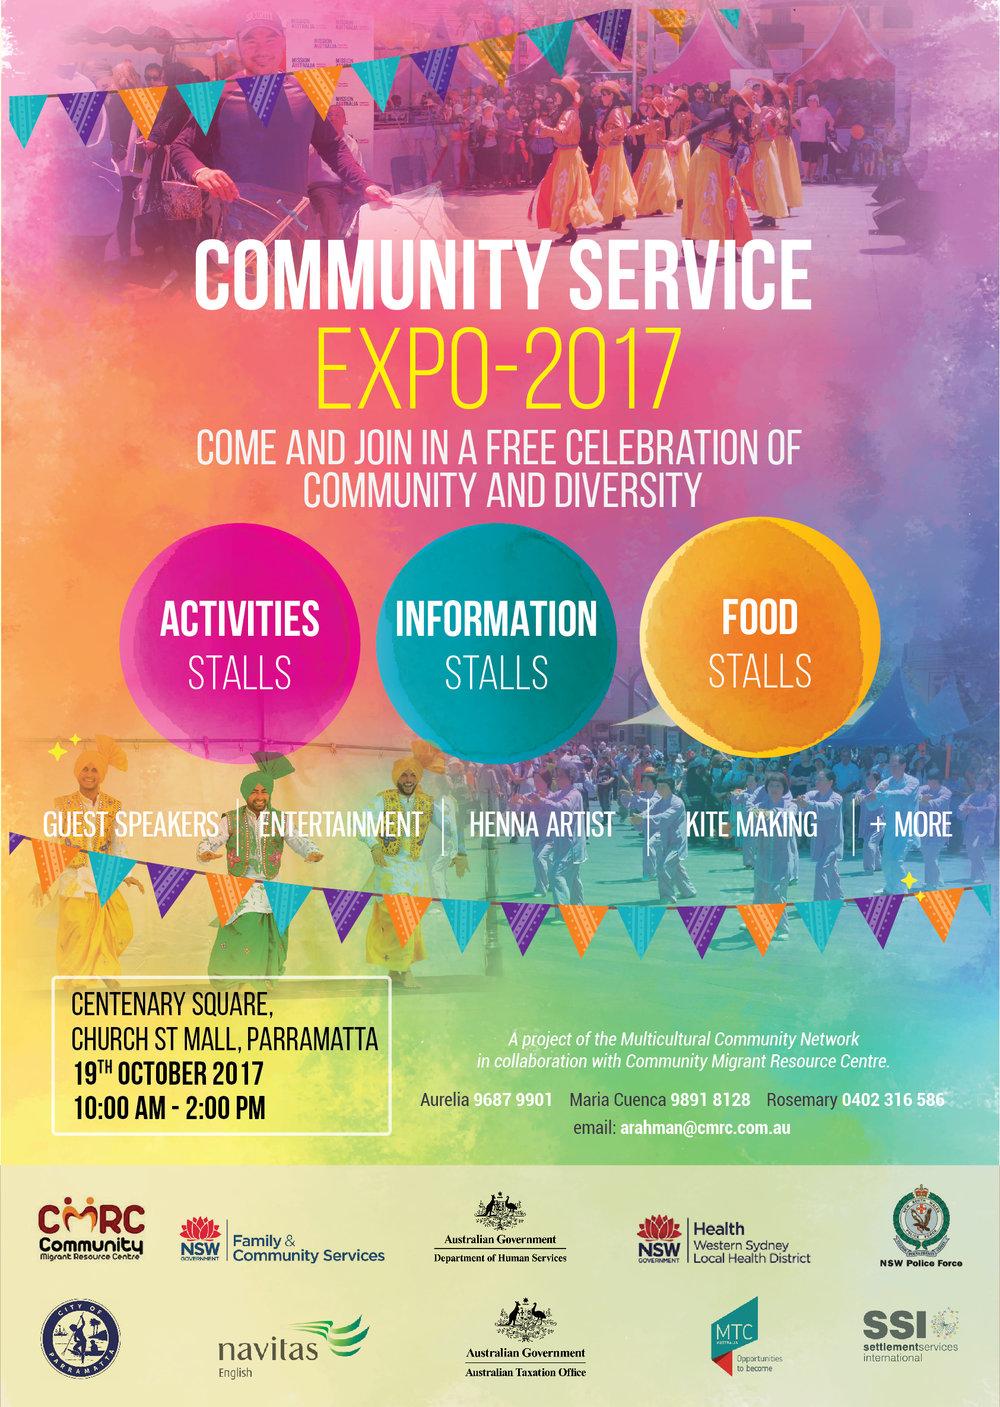 Community Services Expo 2017 copy-01.jpg